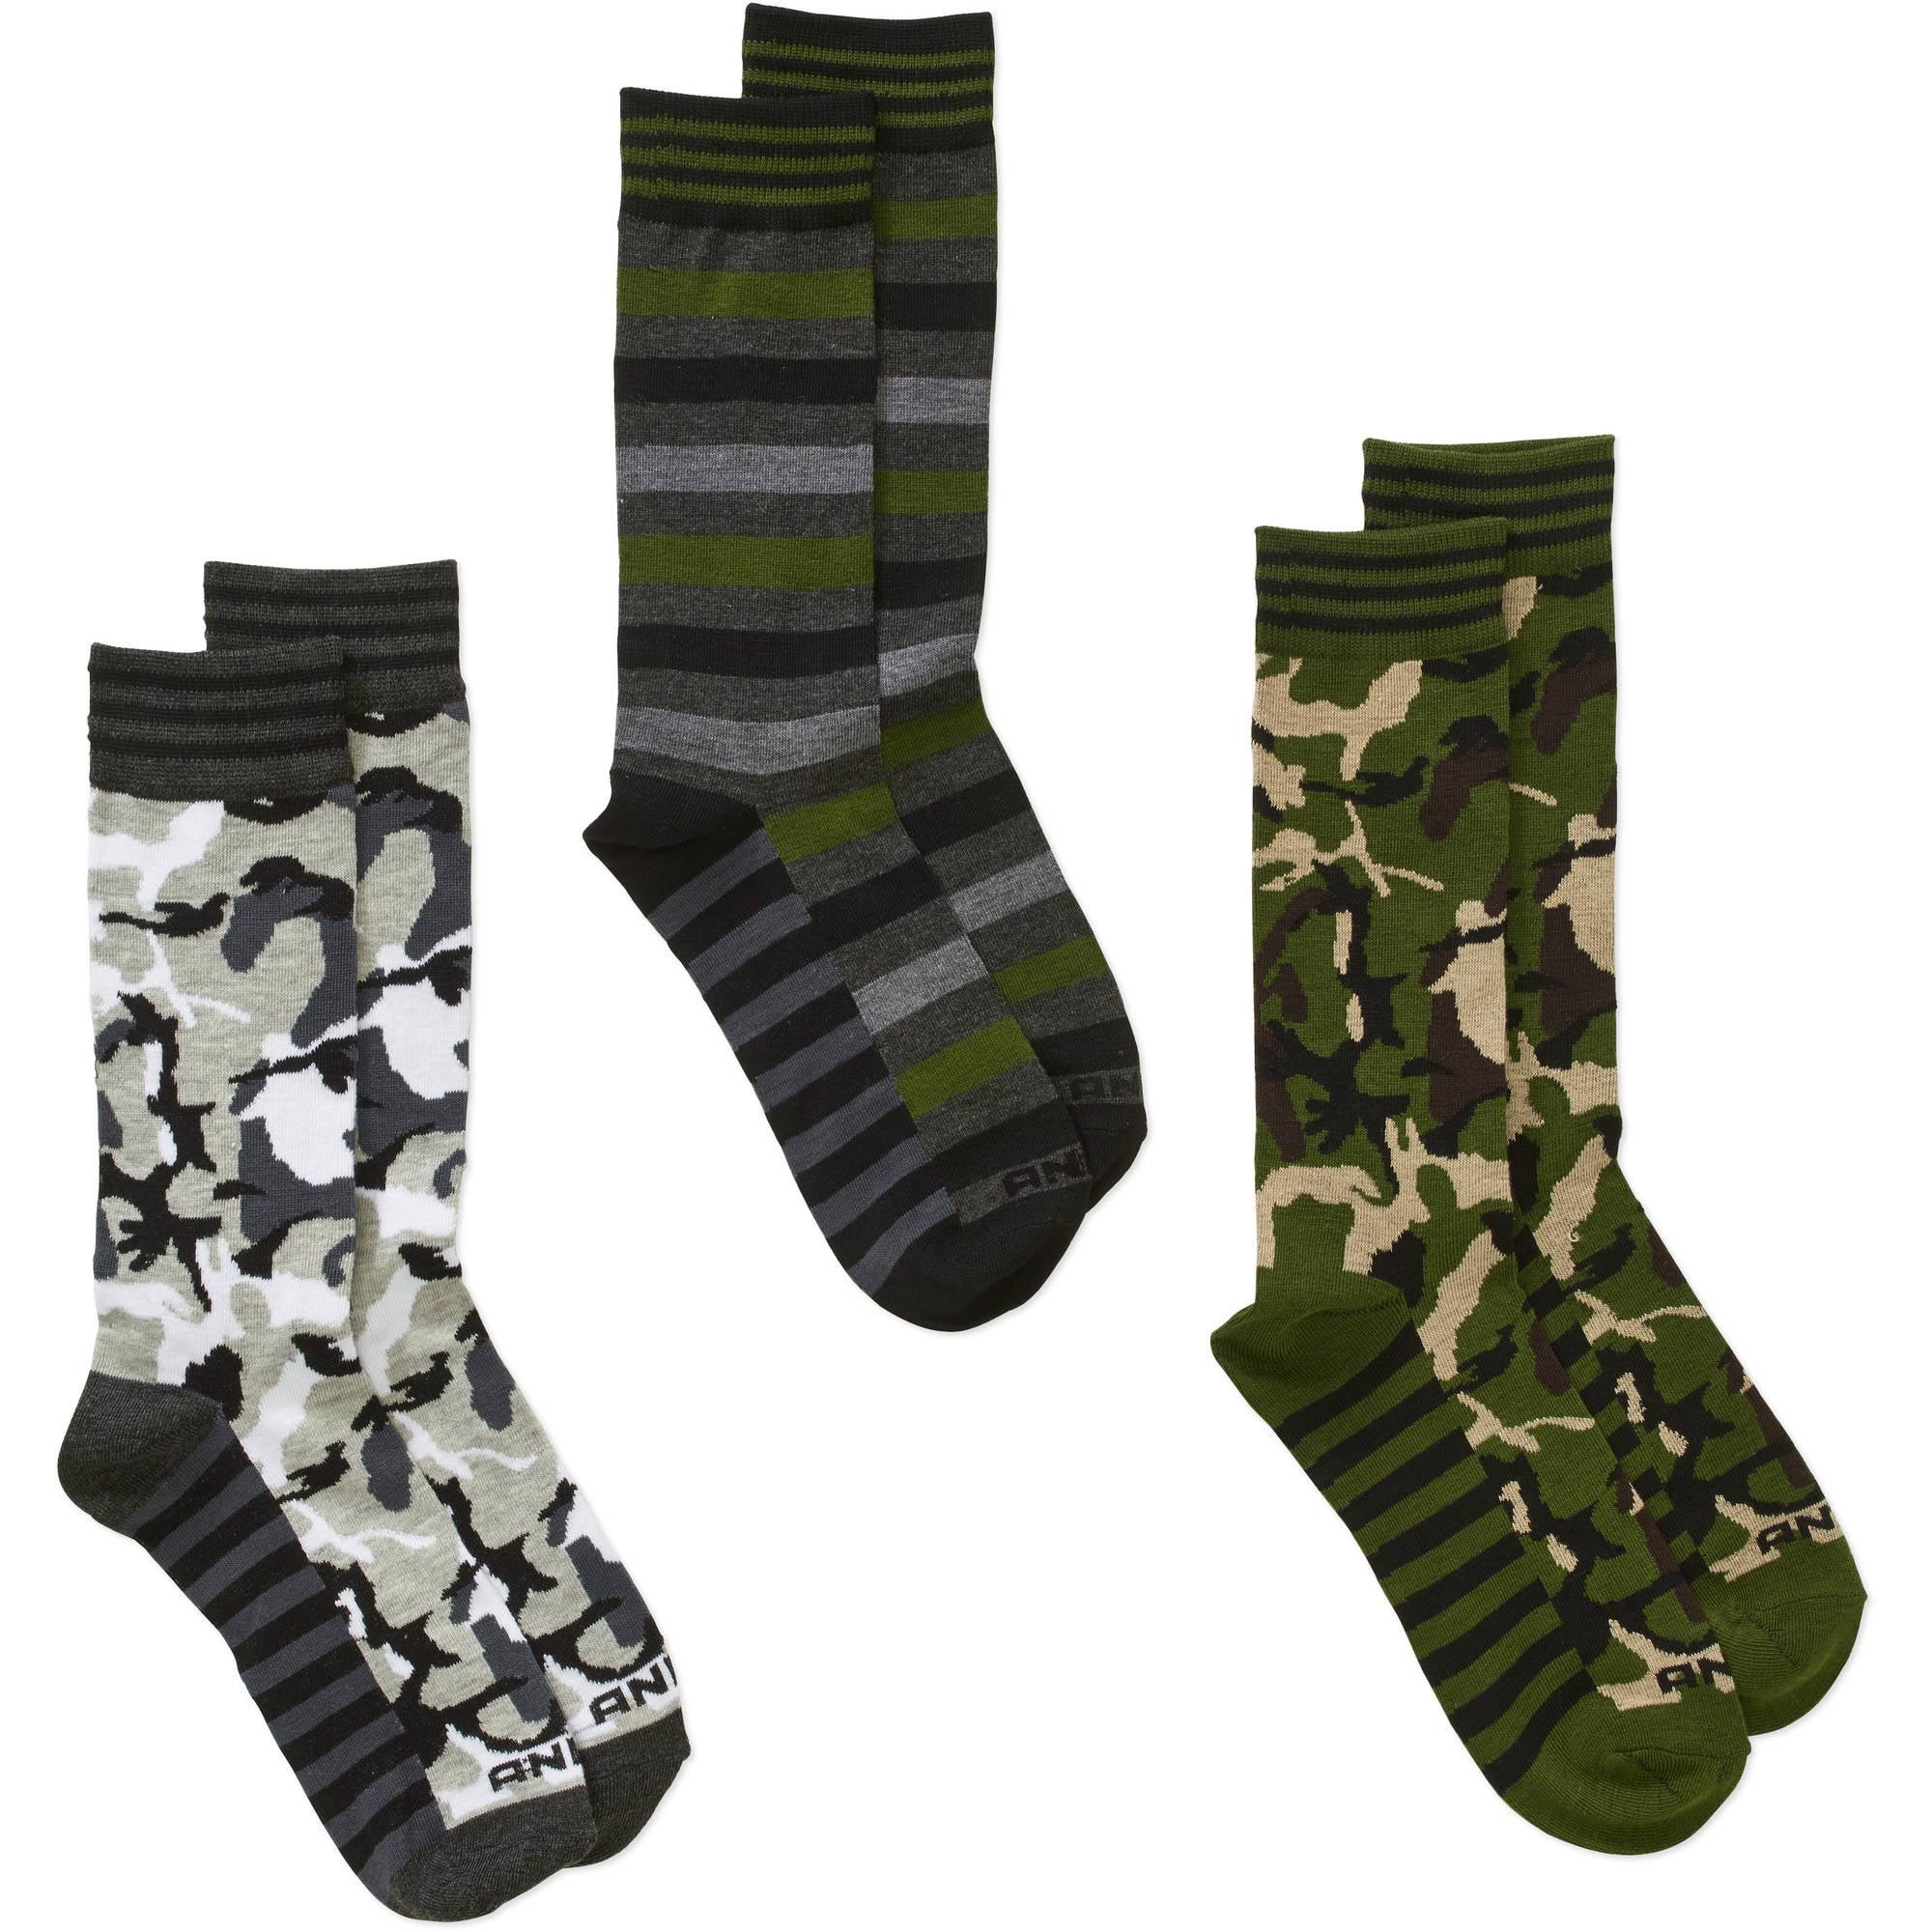 Men\'s Fashion Socks Camo, 3 Pack - Walmart.com